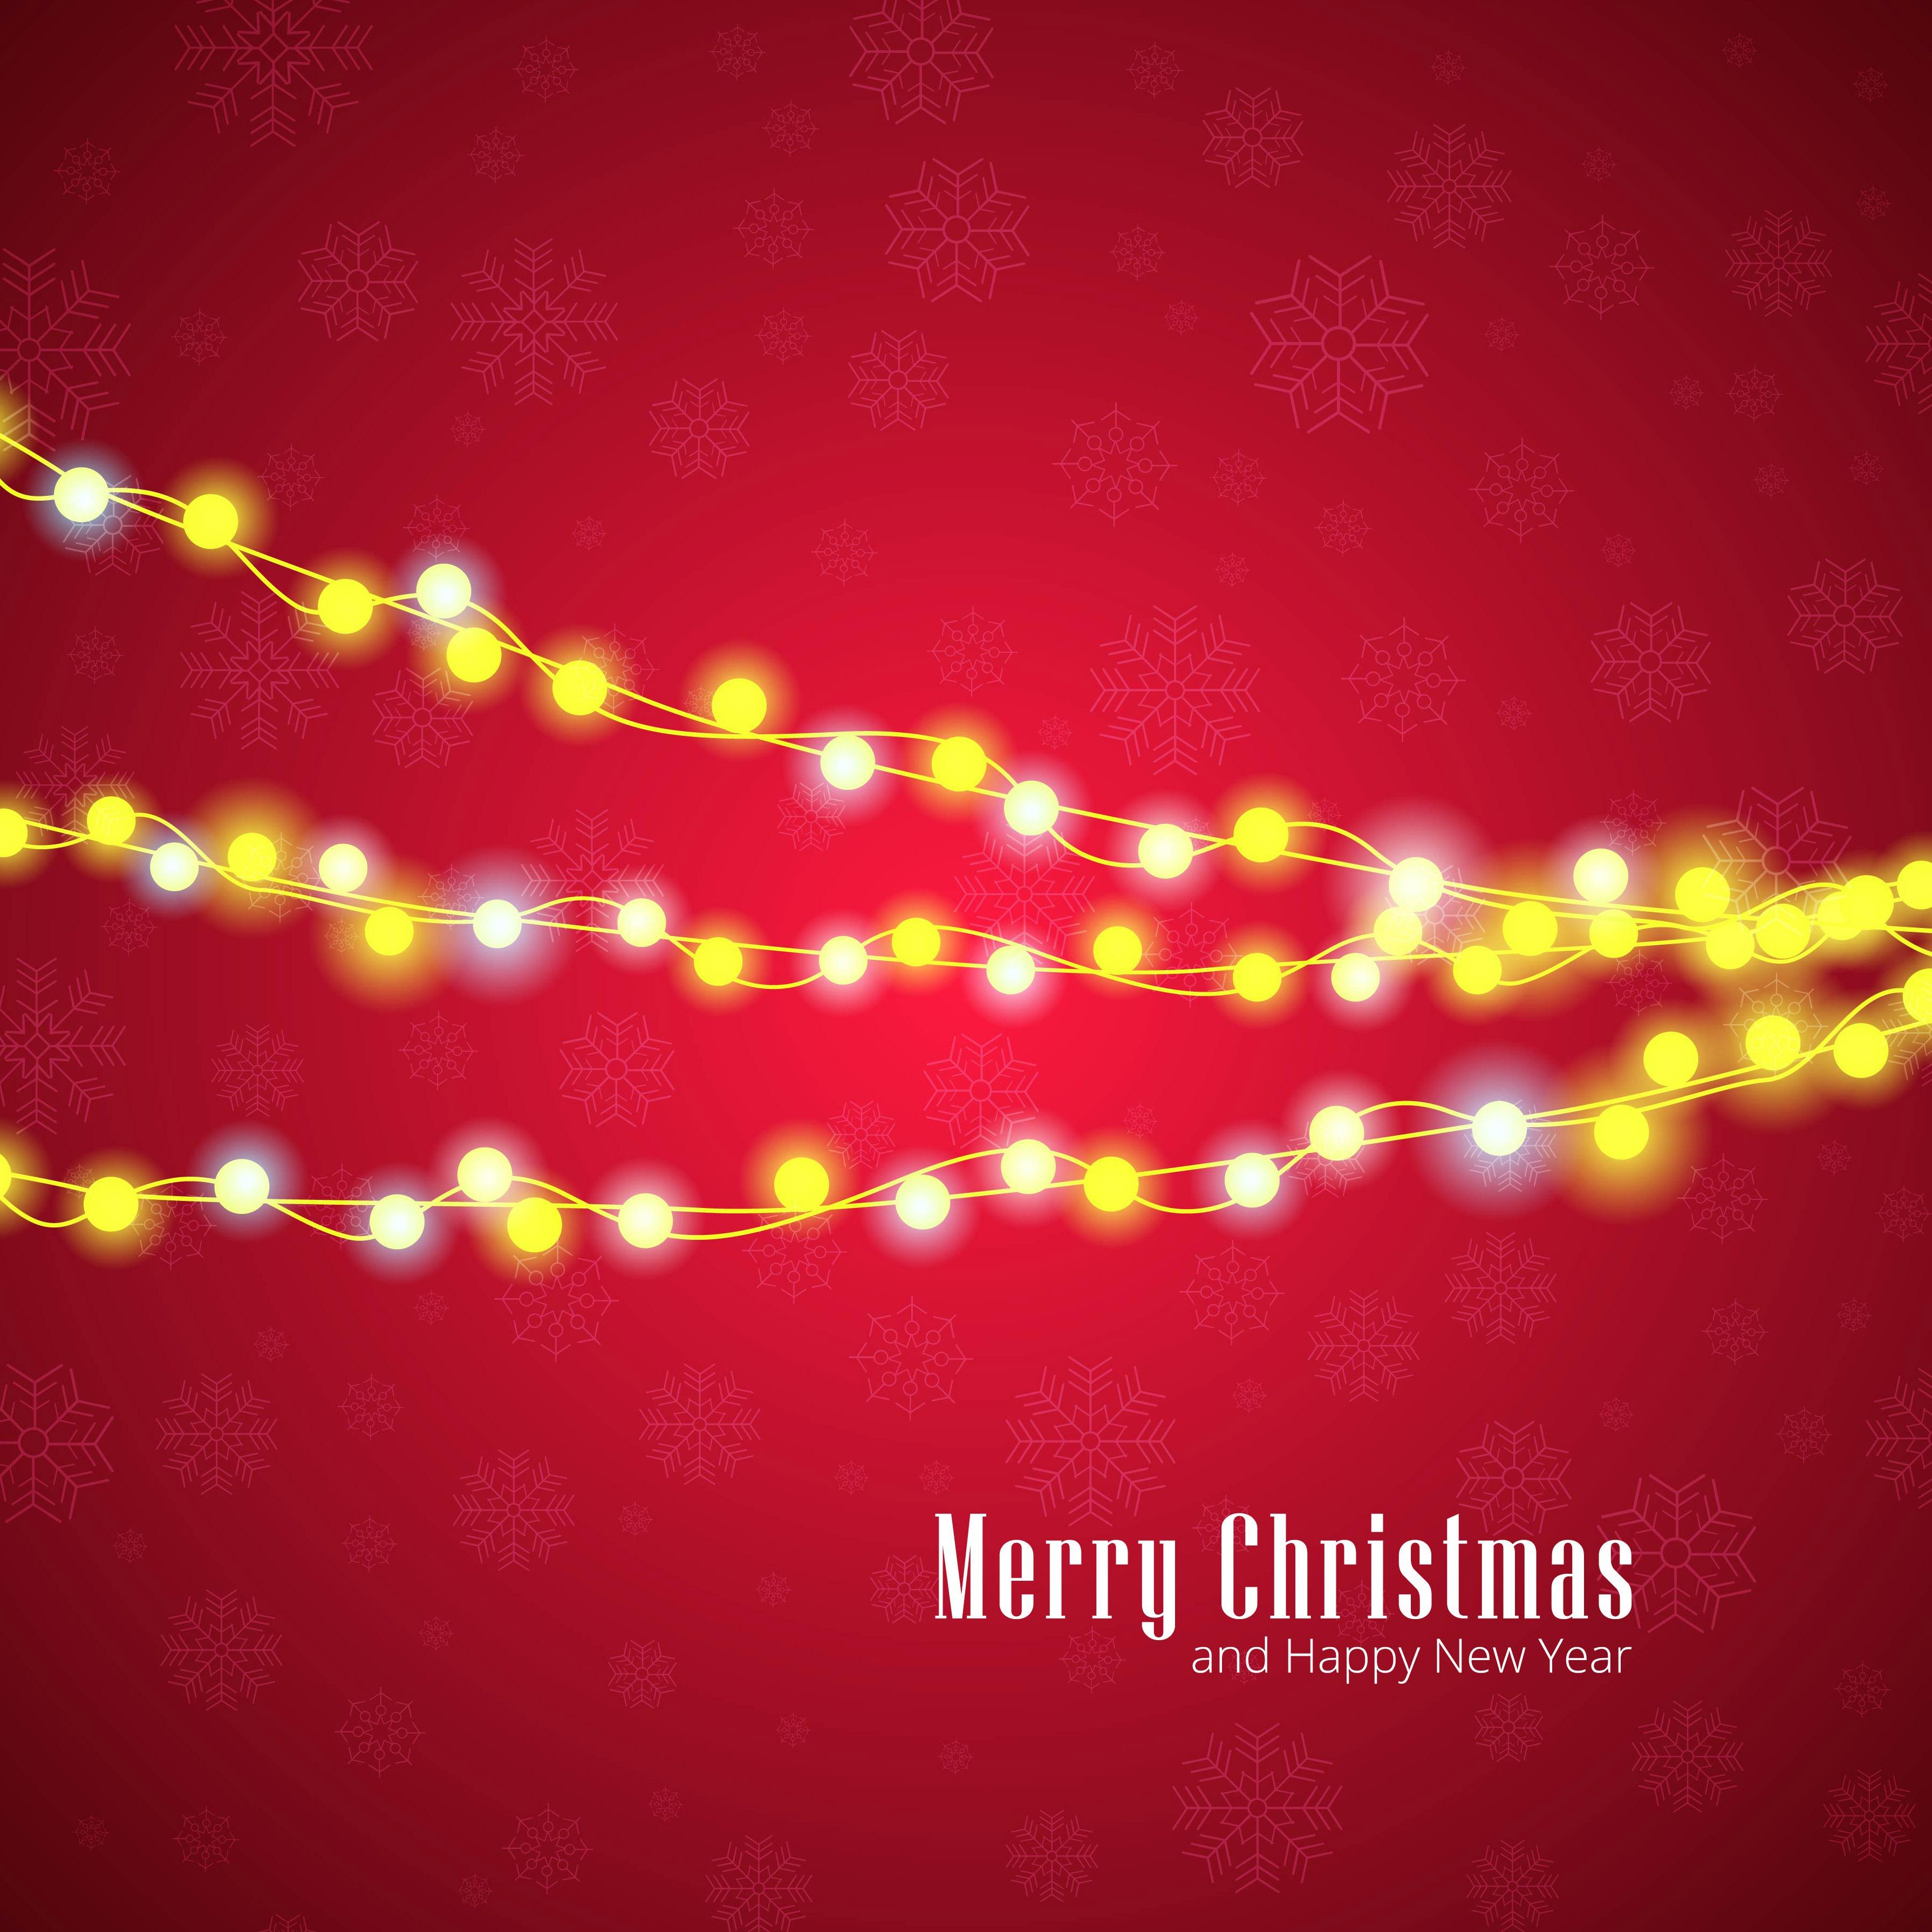 modern mery christmas background